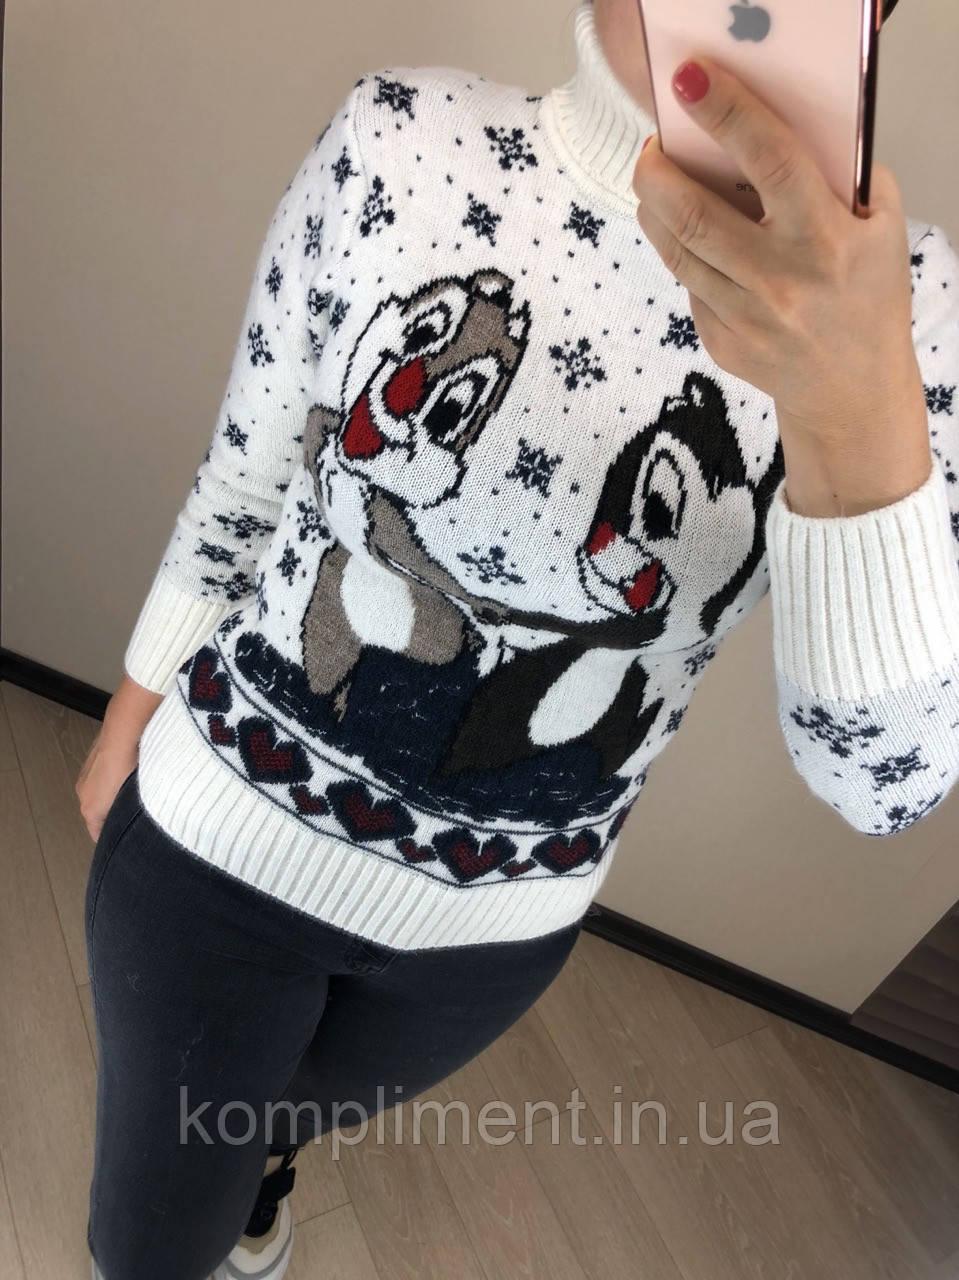 Женский шерстяной  свитер с рисунком бурундуки, белый